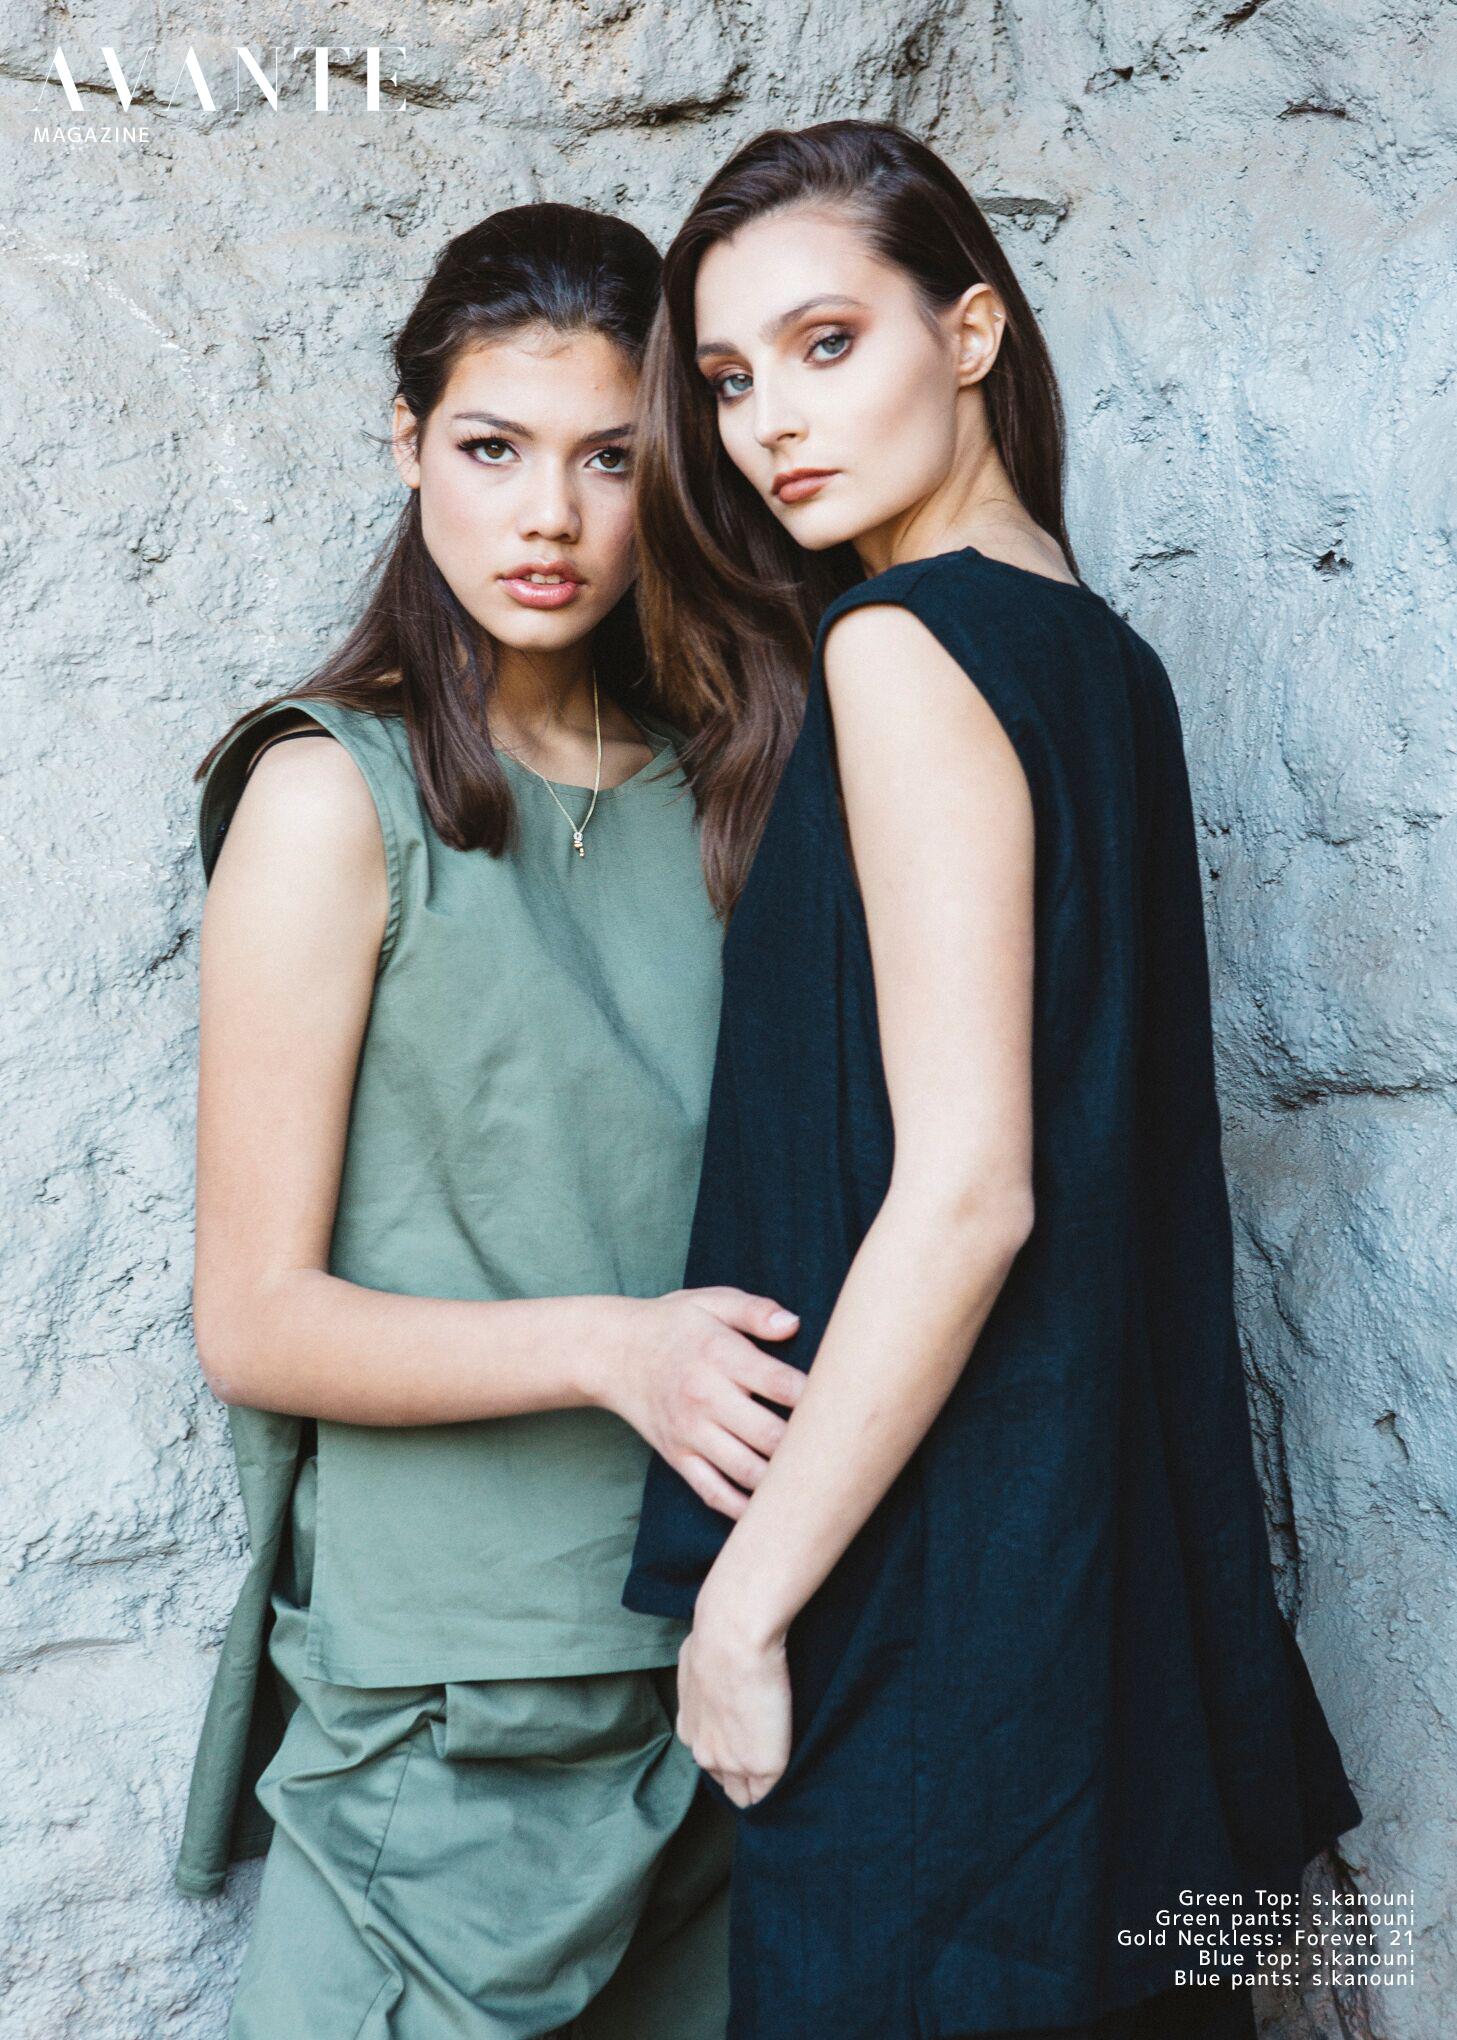 seanhazen_fashion_LAModels_testshoot_001_preview.jpg